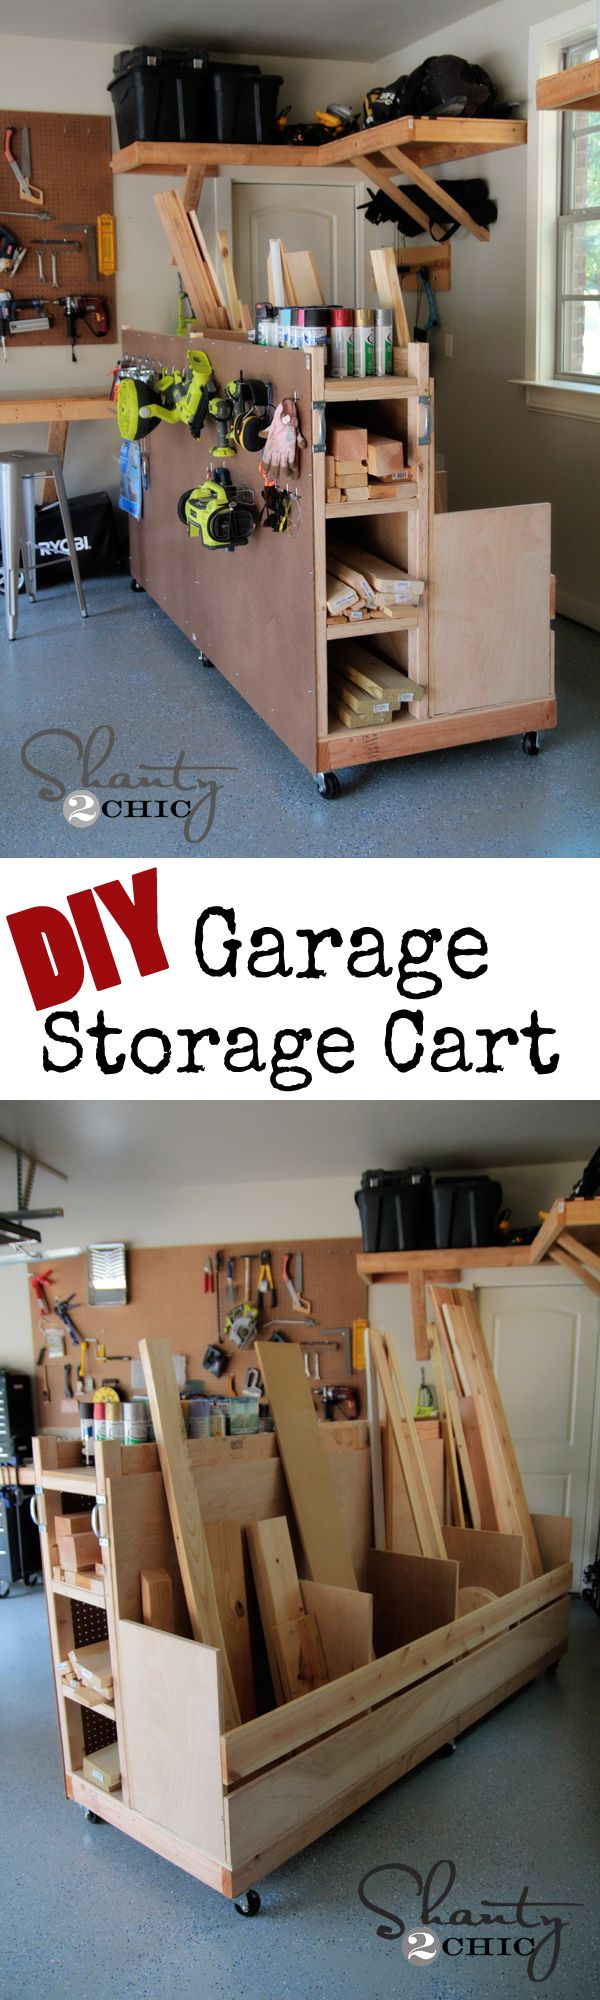 DIY Garage Storage Cart Perfect to hold